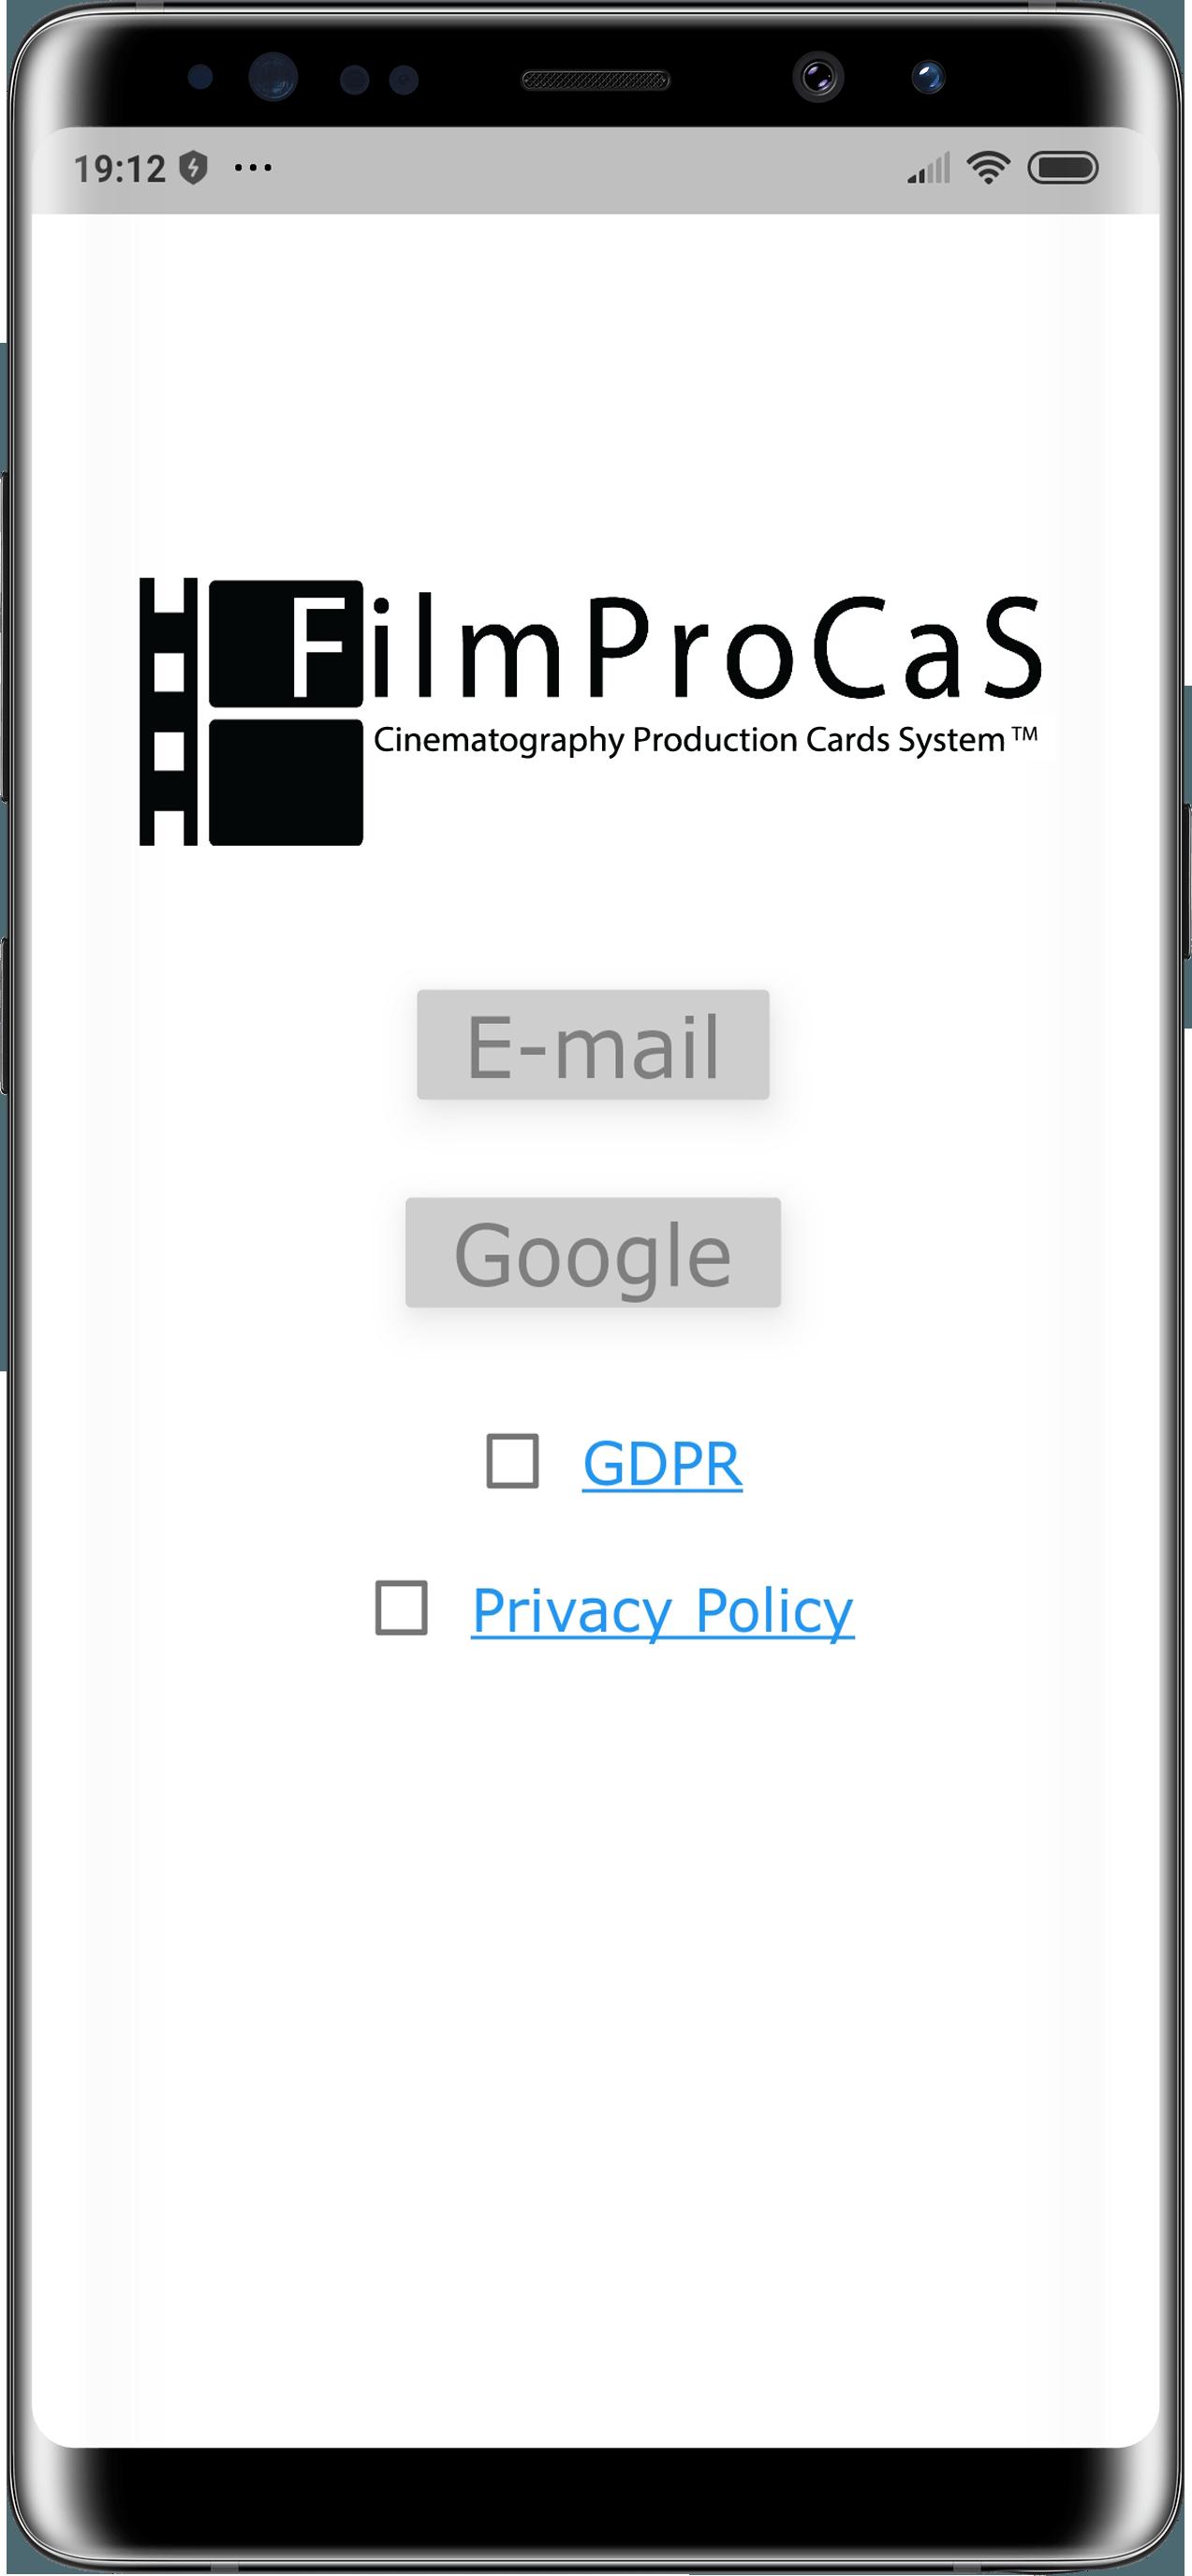 FilmProCaS  Cinematography Production Cards System